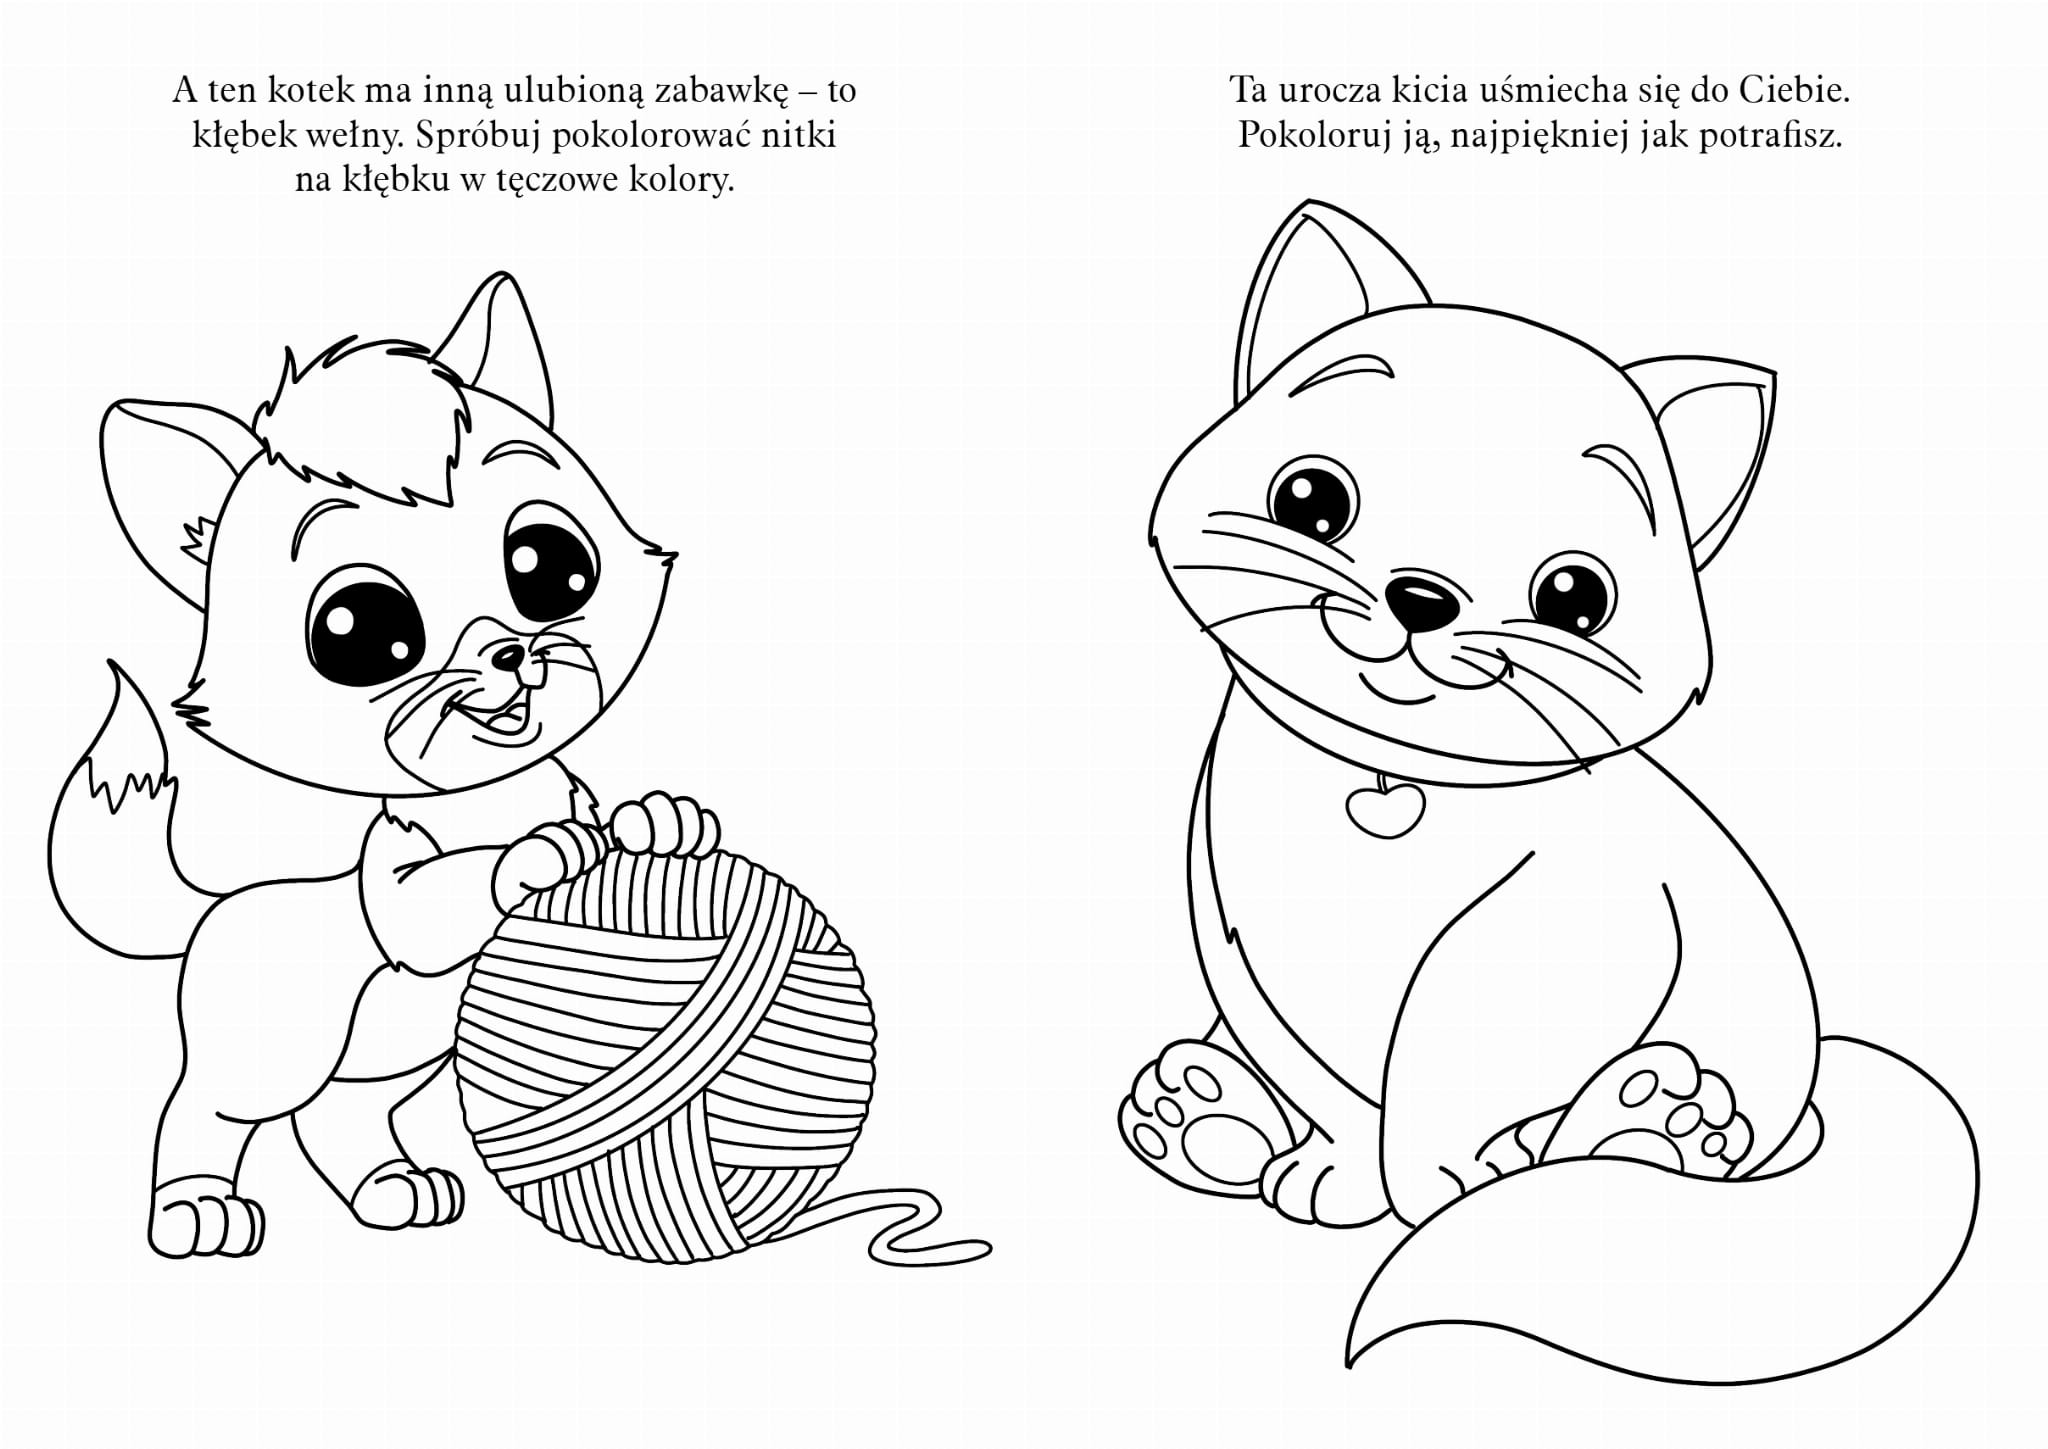 Moje Male Kotki Kolorowanka Z Naklejkami Z Brokatem Books And Fun